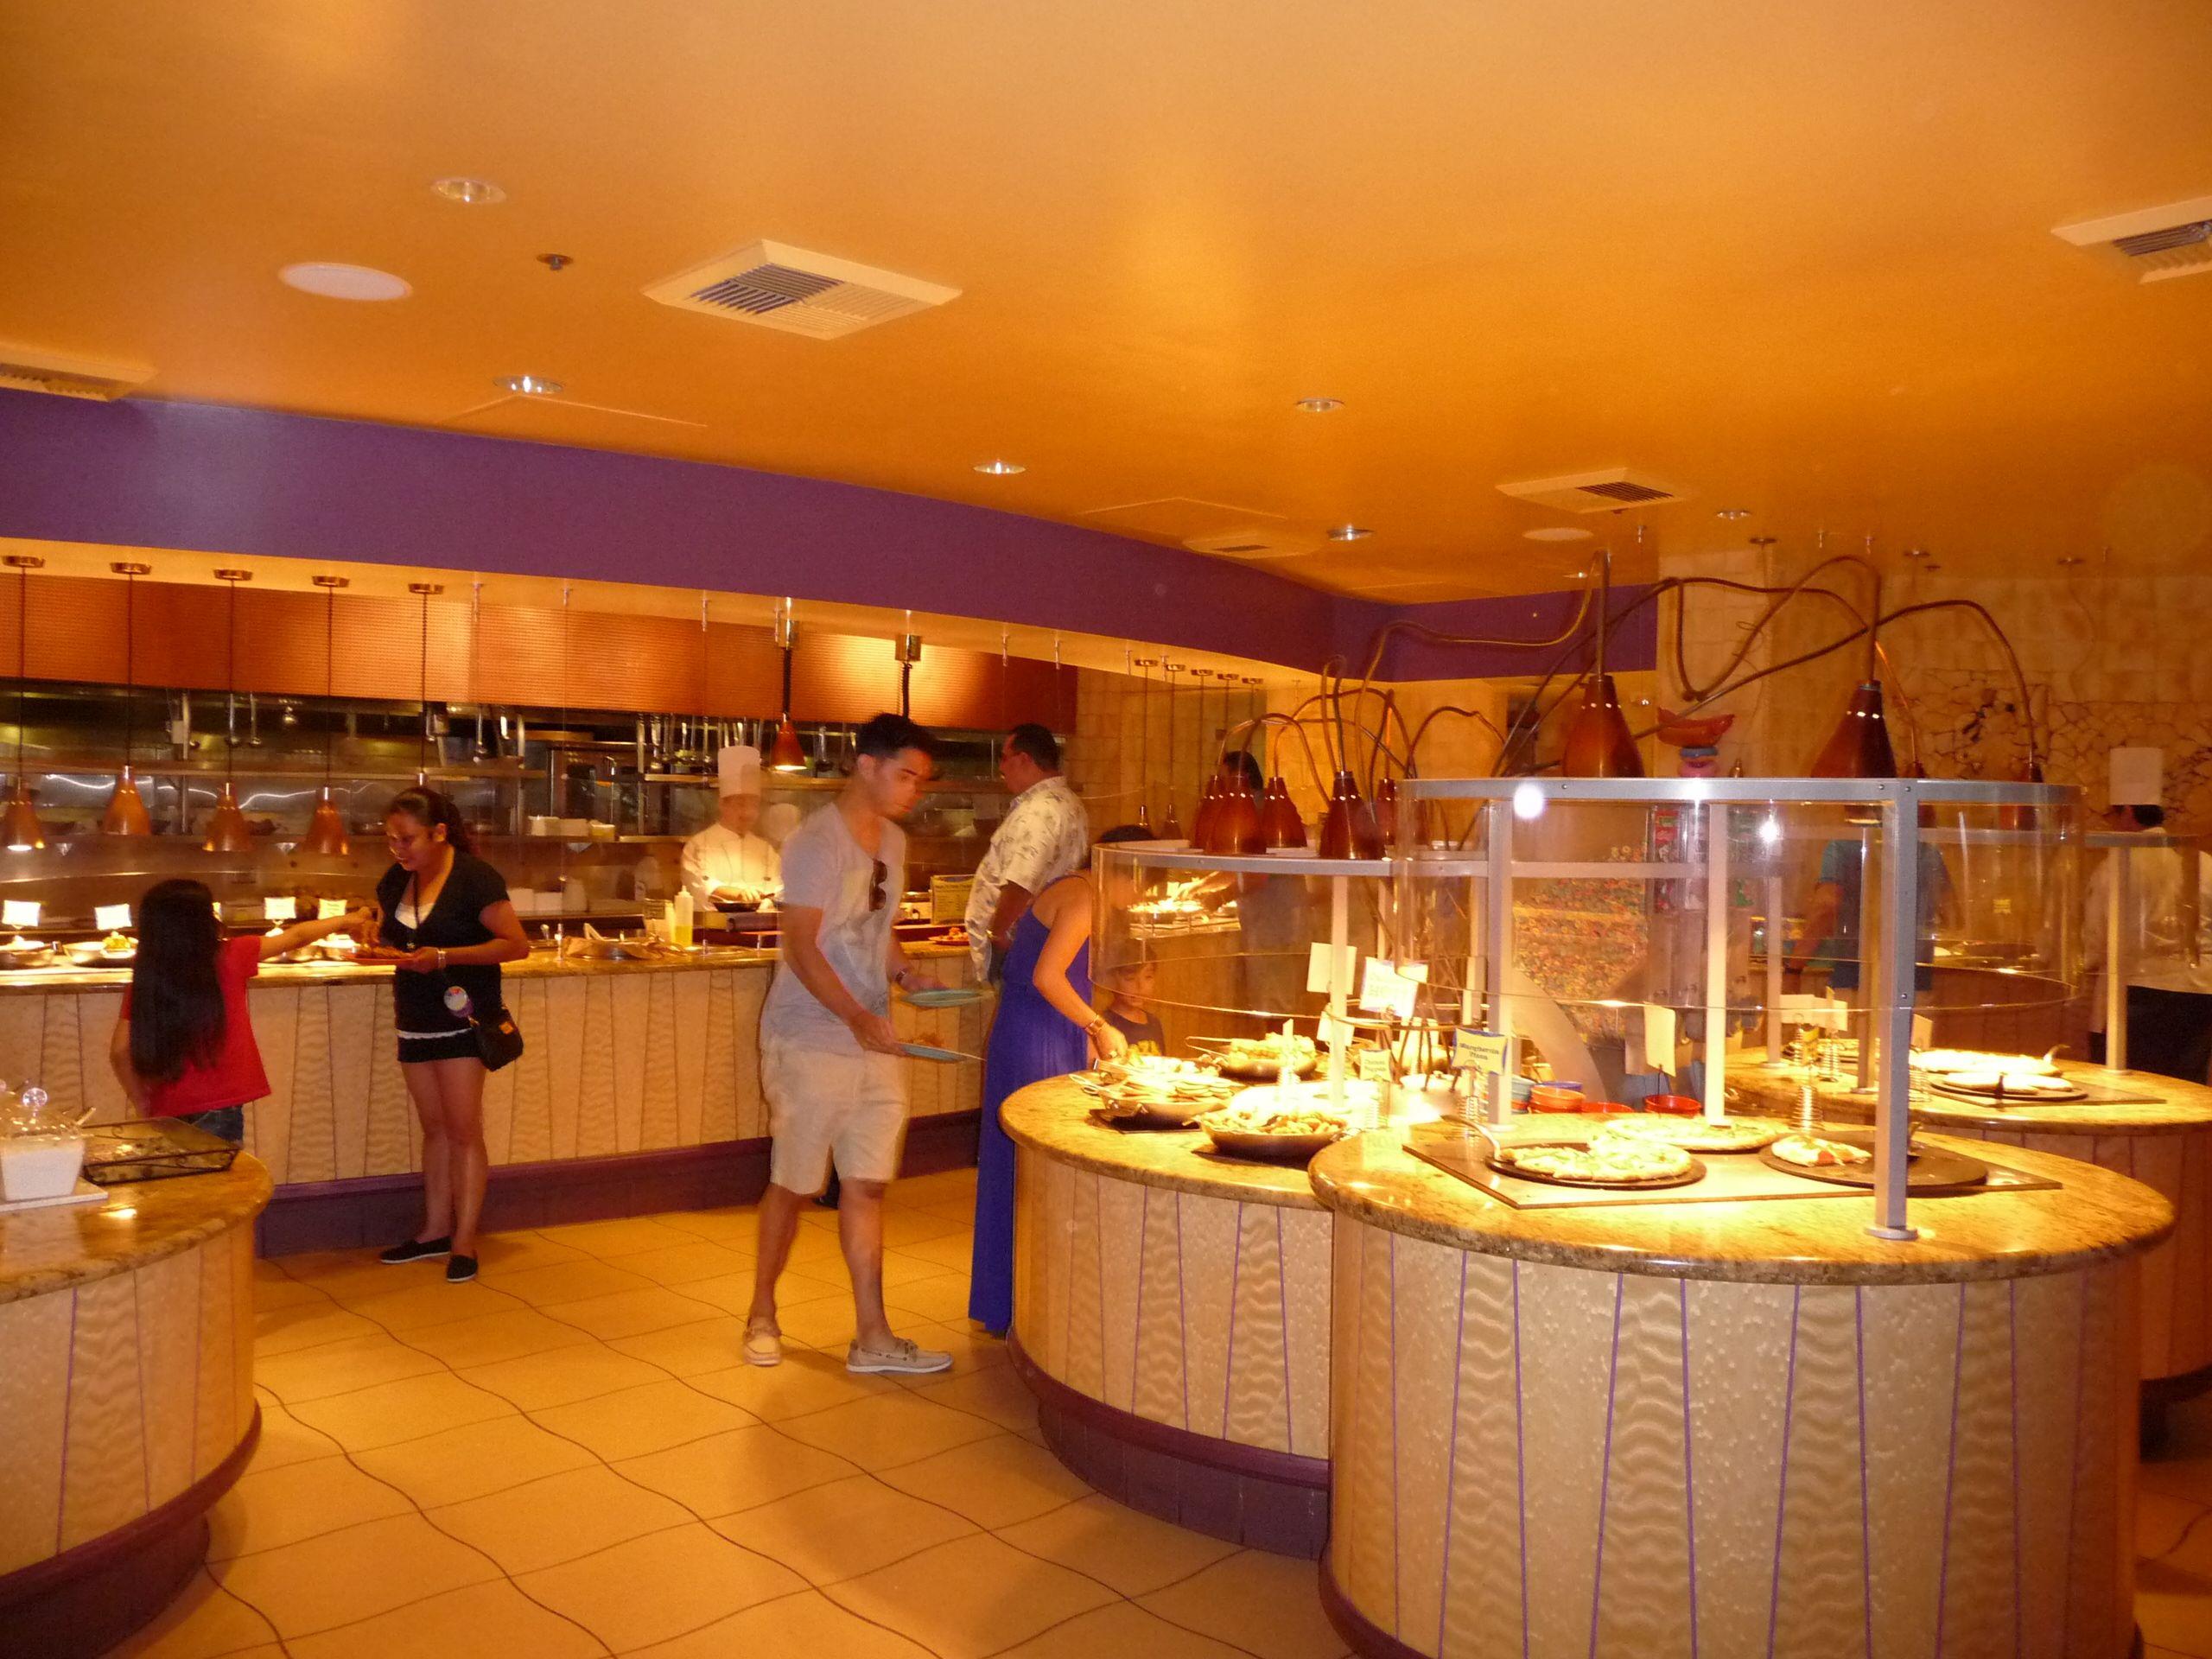 Goofy\'s Kitchen | Dreaming of Disney | Pinterest | Disneyland food